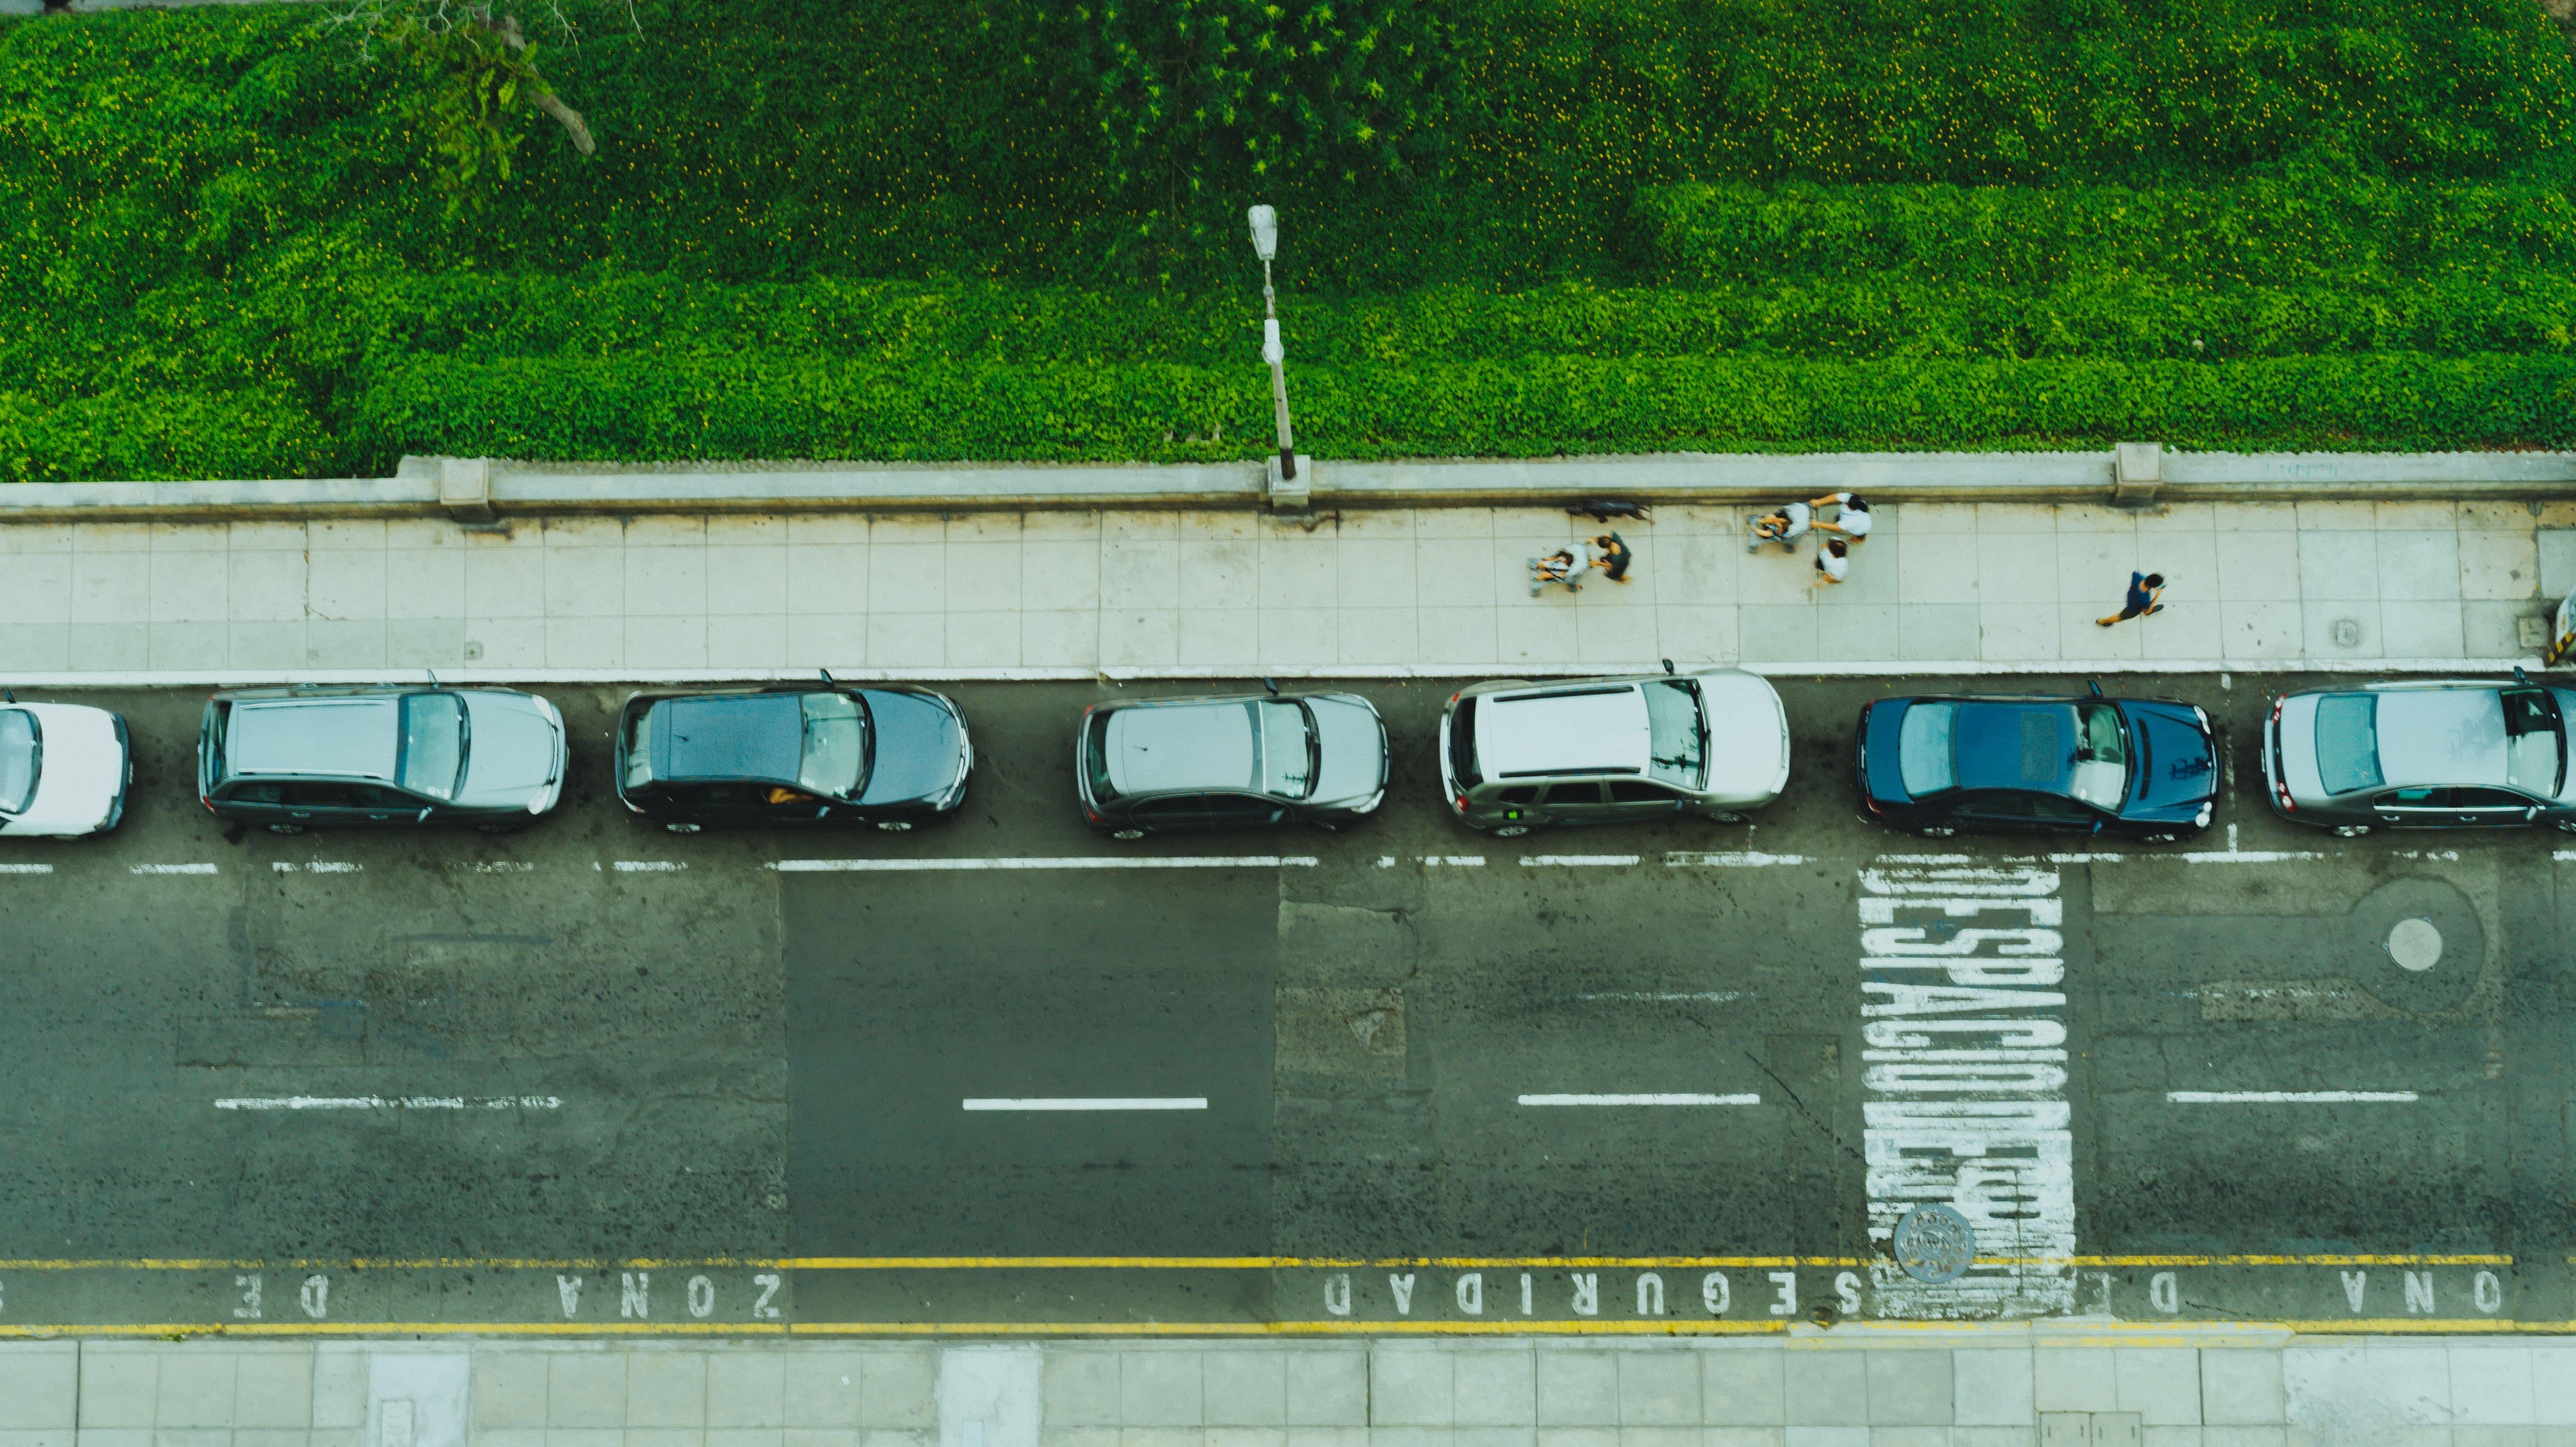 mantenimiento de coches parados